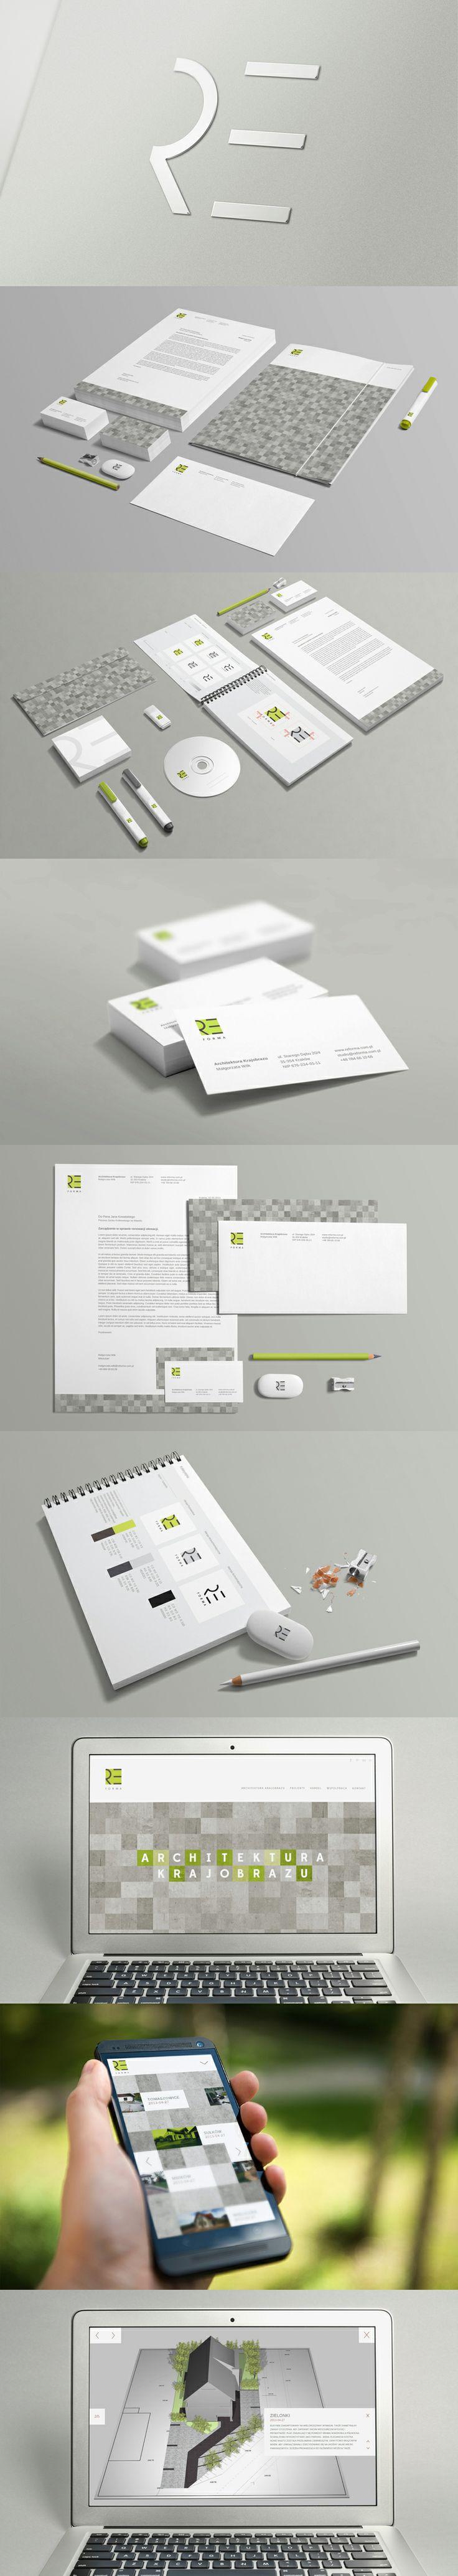 Reforma by Clou Studio. #branding #design #logo #identity #corporate #id #print #cloustudio